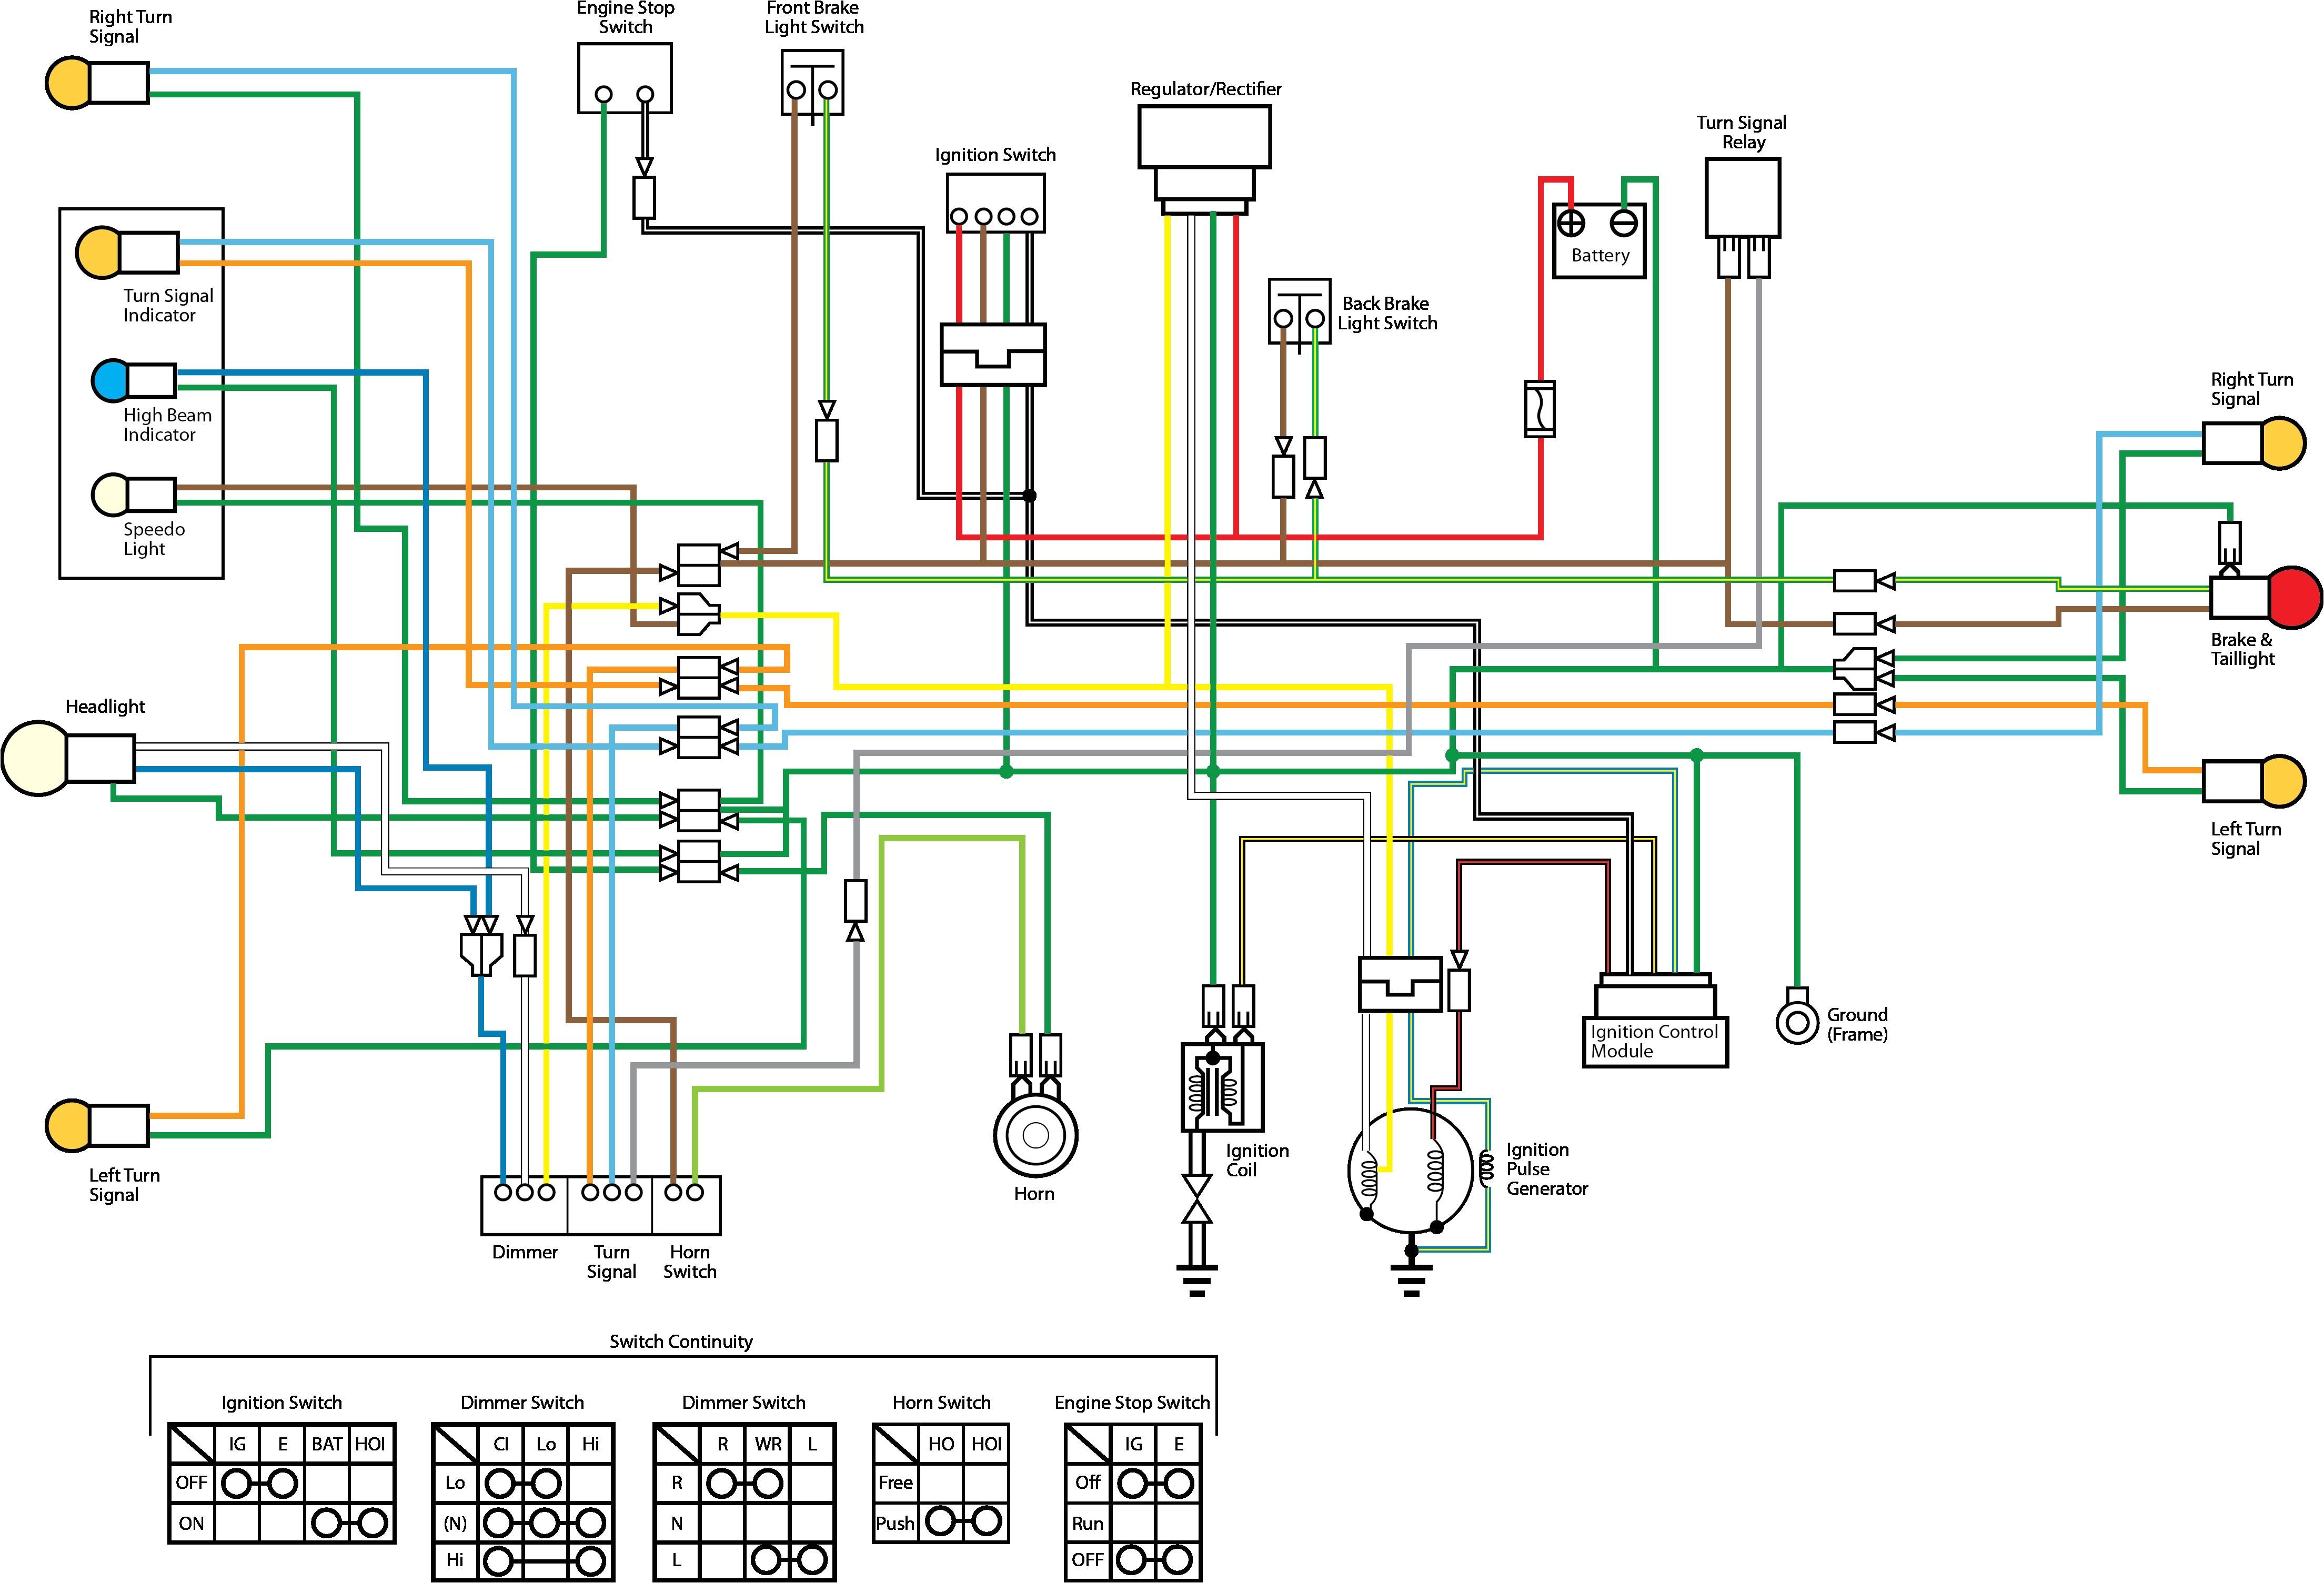 zx7r wiring diagram wiring diagram imgzx7r wiring diagram wiring diagram show zx7r wiring diagram 1999 2001